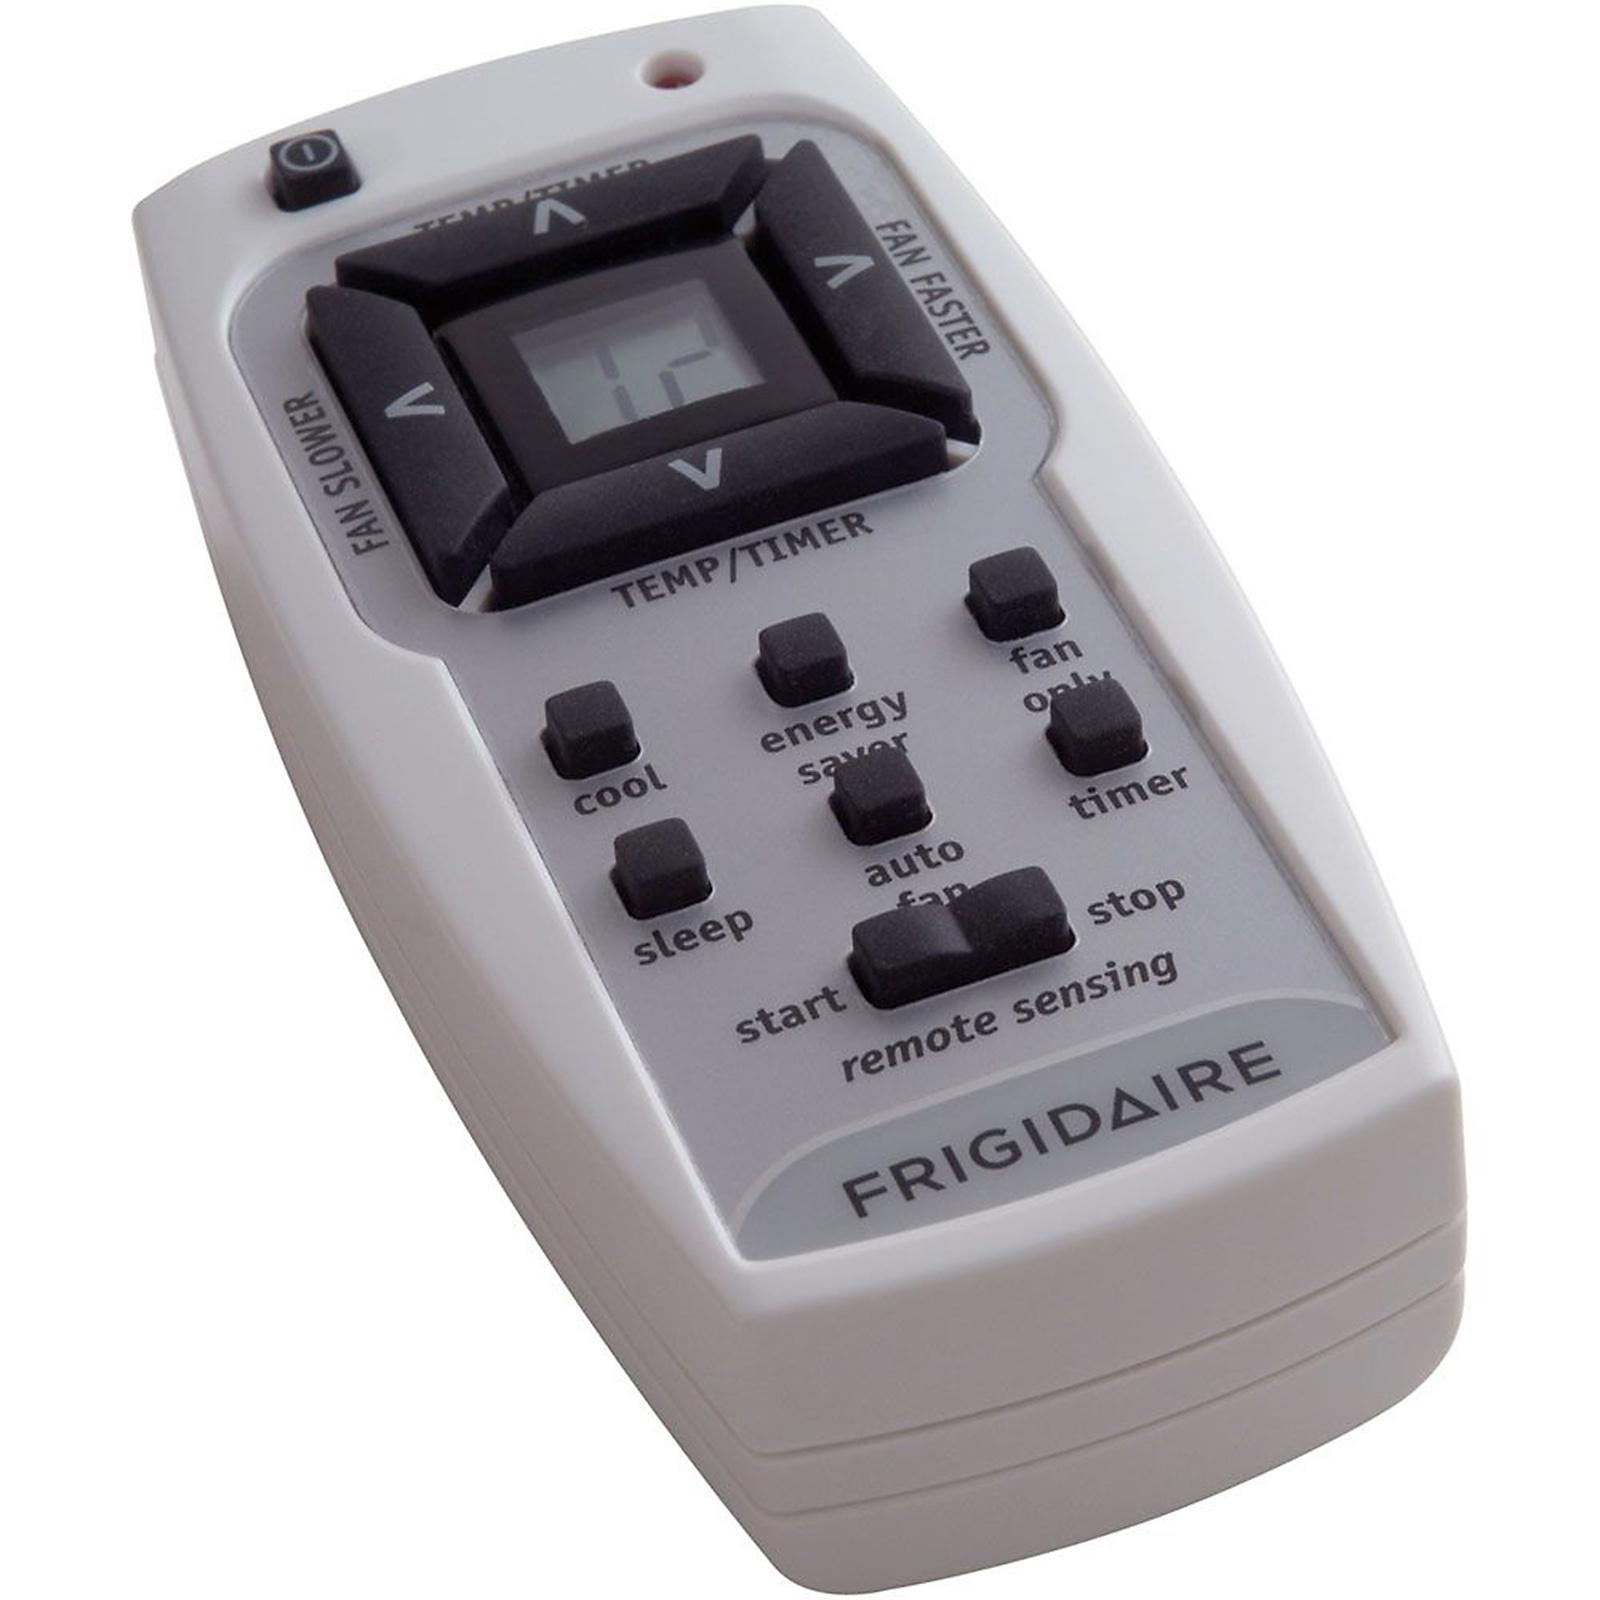 Frigidaire 10,000 BTU 115-Volt Window-Mounted Compact Air Conditioner with Temperature Sensing Remote Control